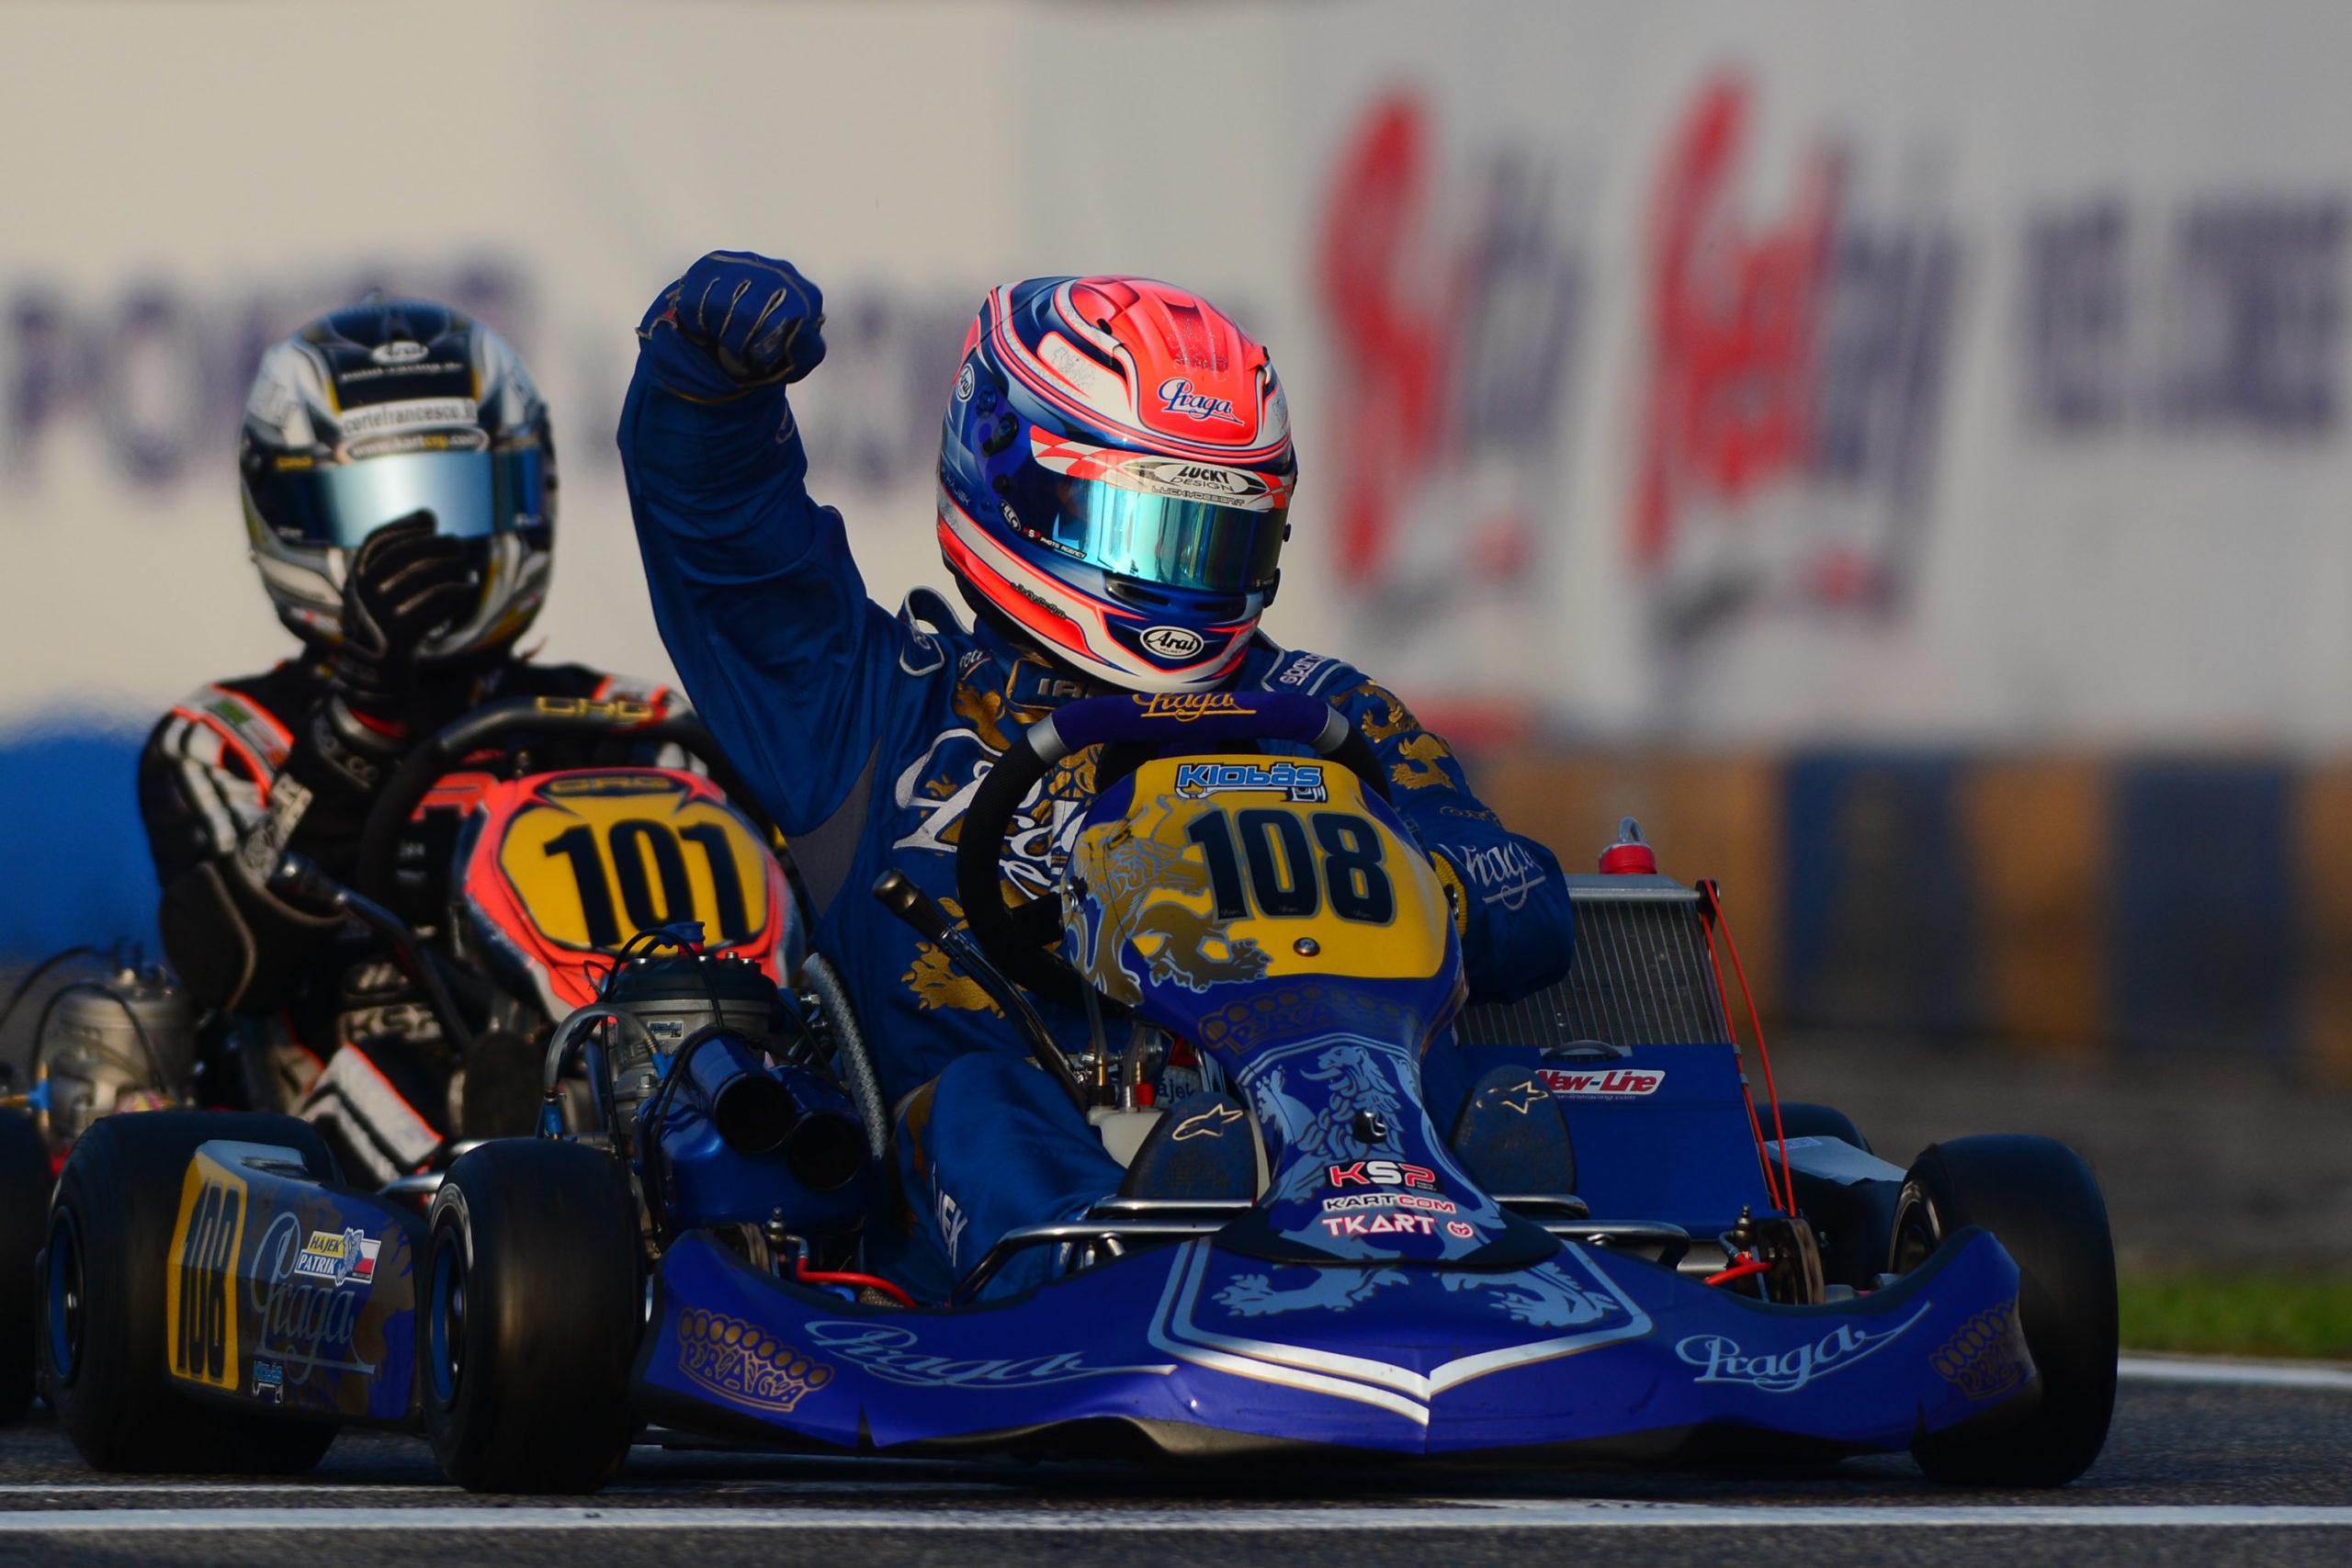 PRAGA KART RACING WINS IN KZ2